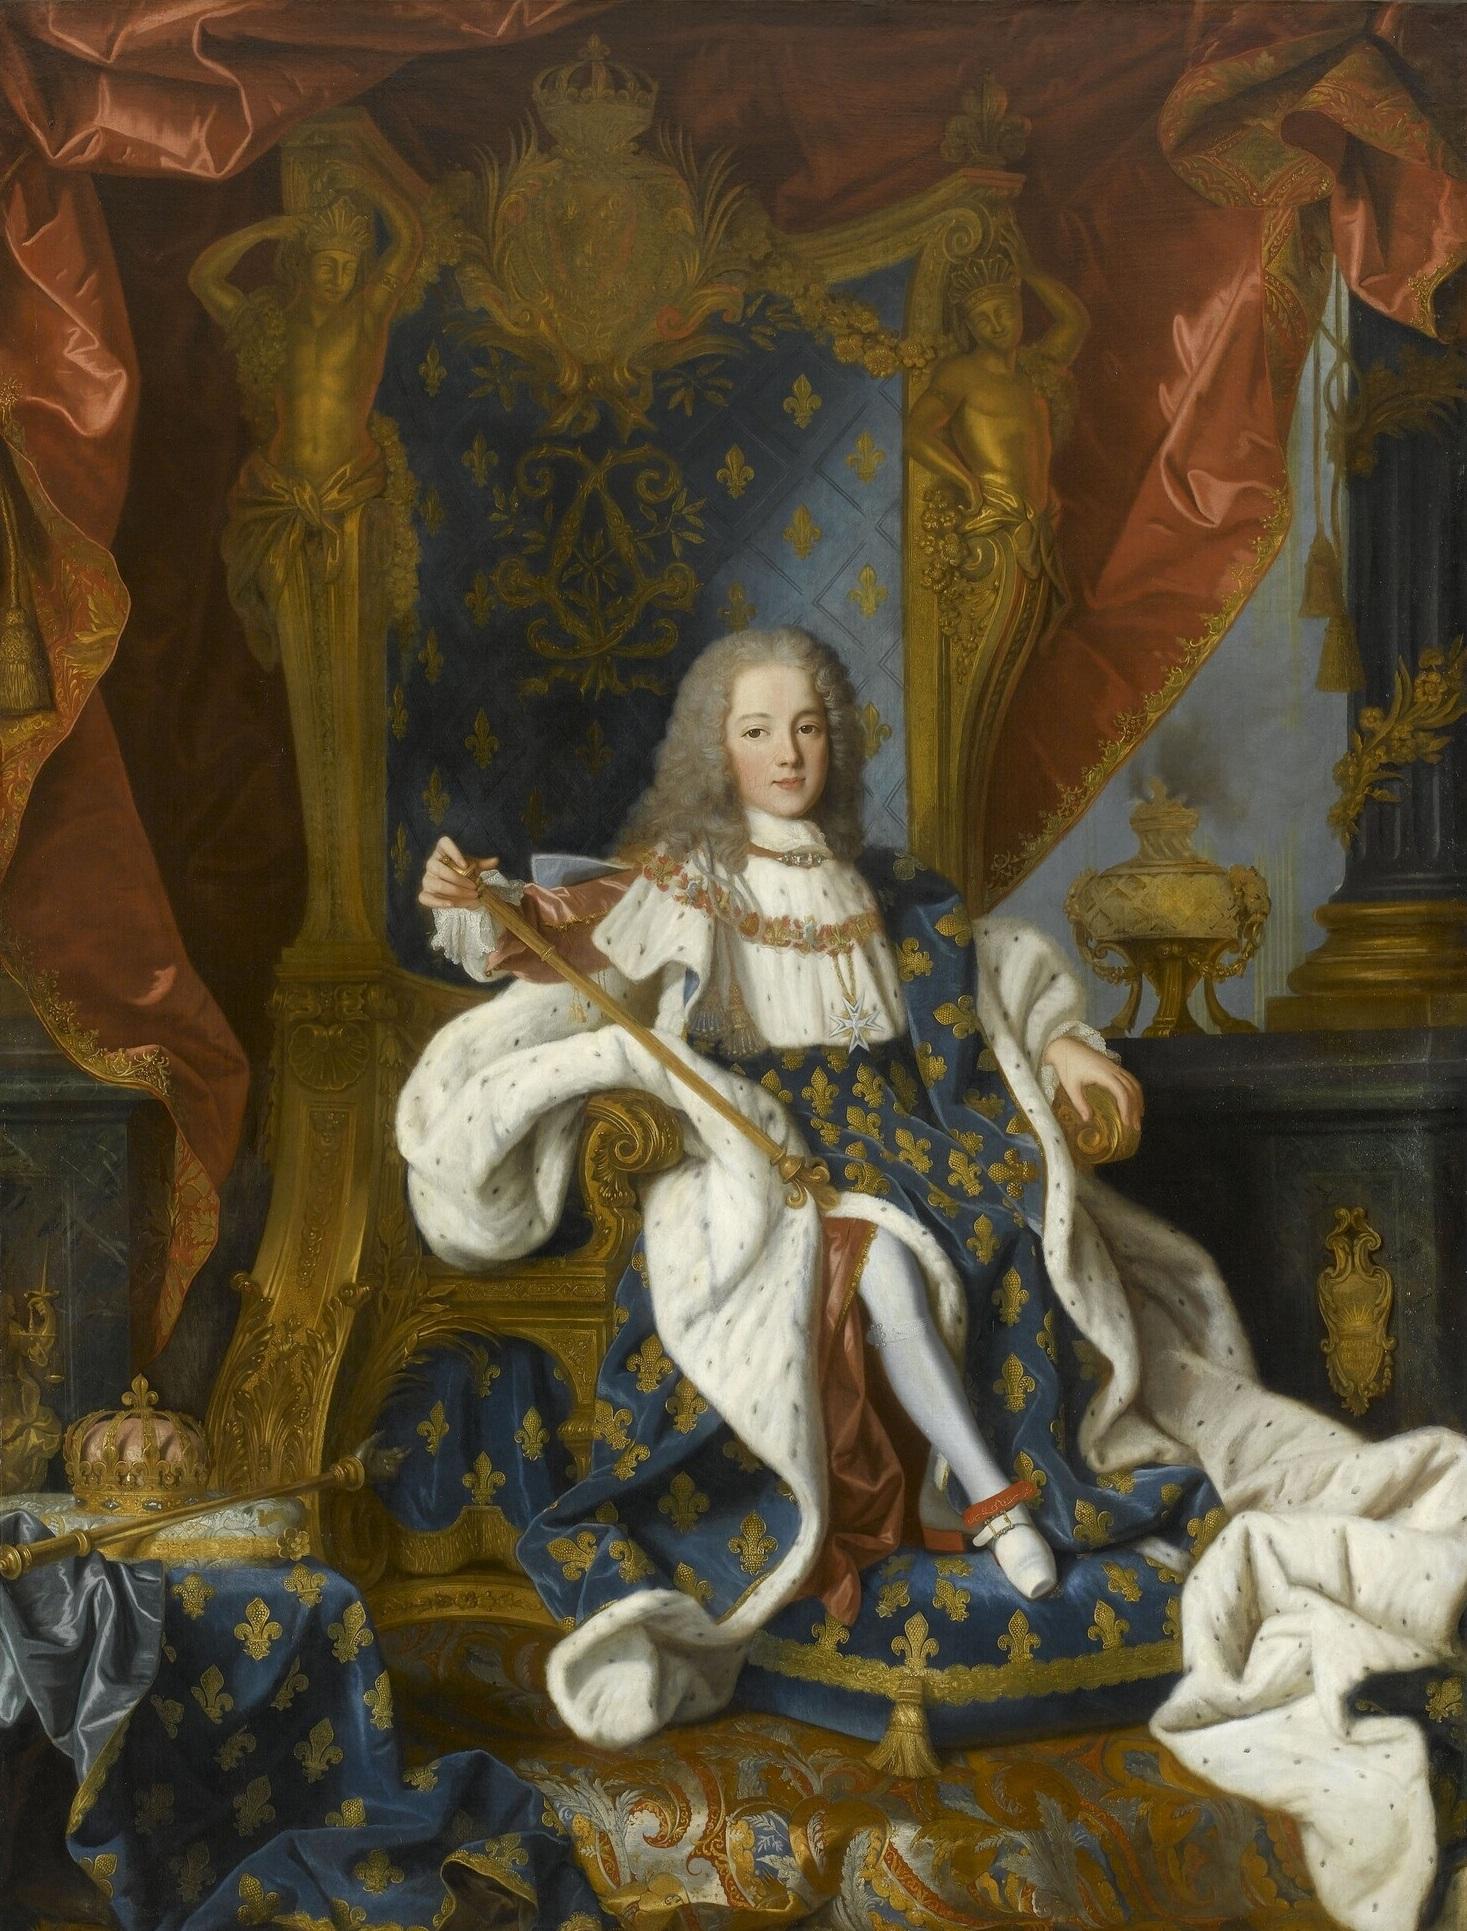 15 Year Boys Bedroom: File:Louis XV Ranc 2.jpg